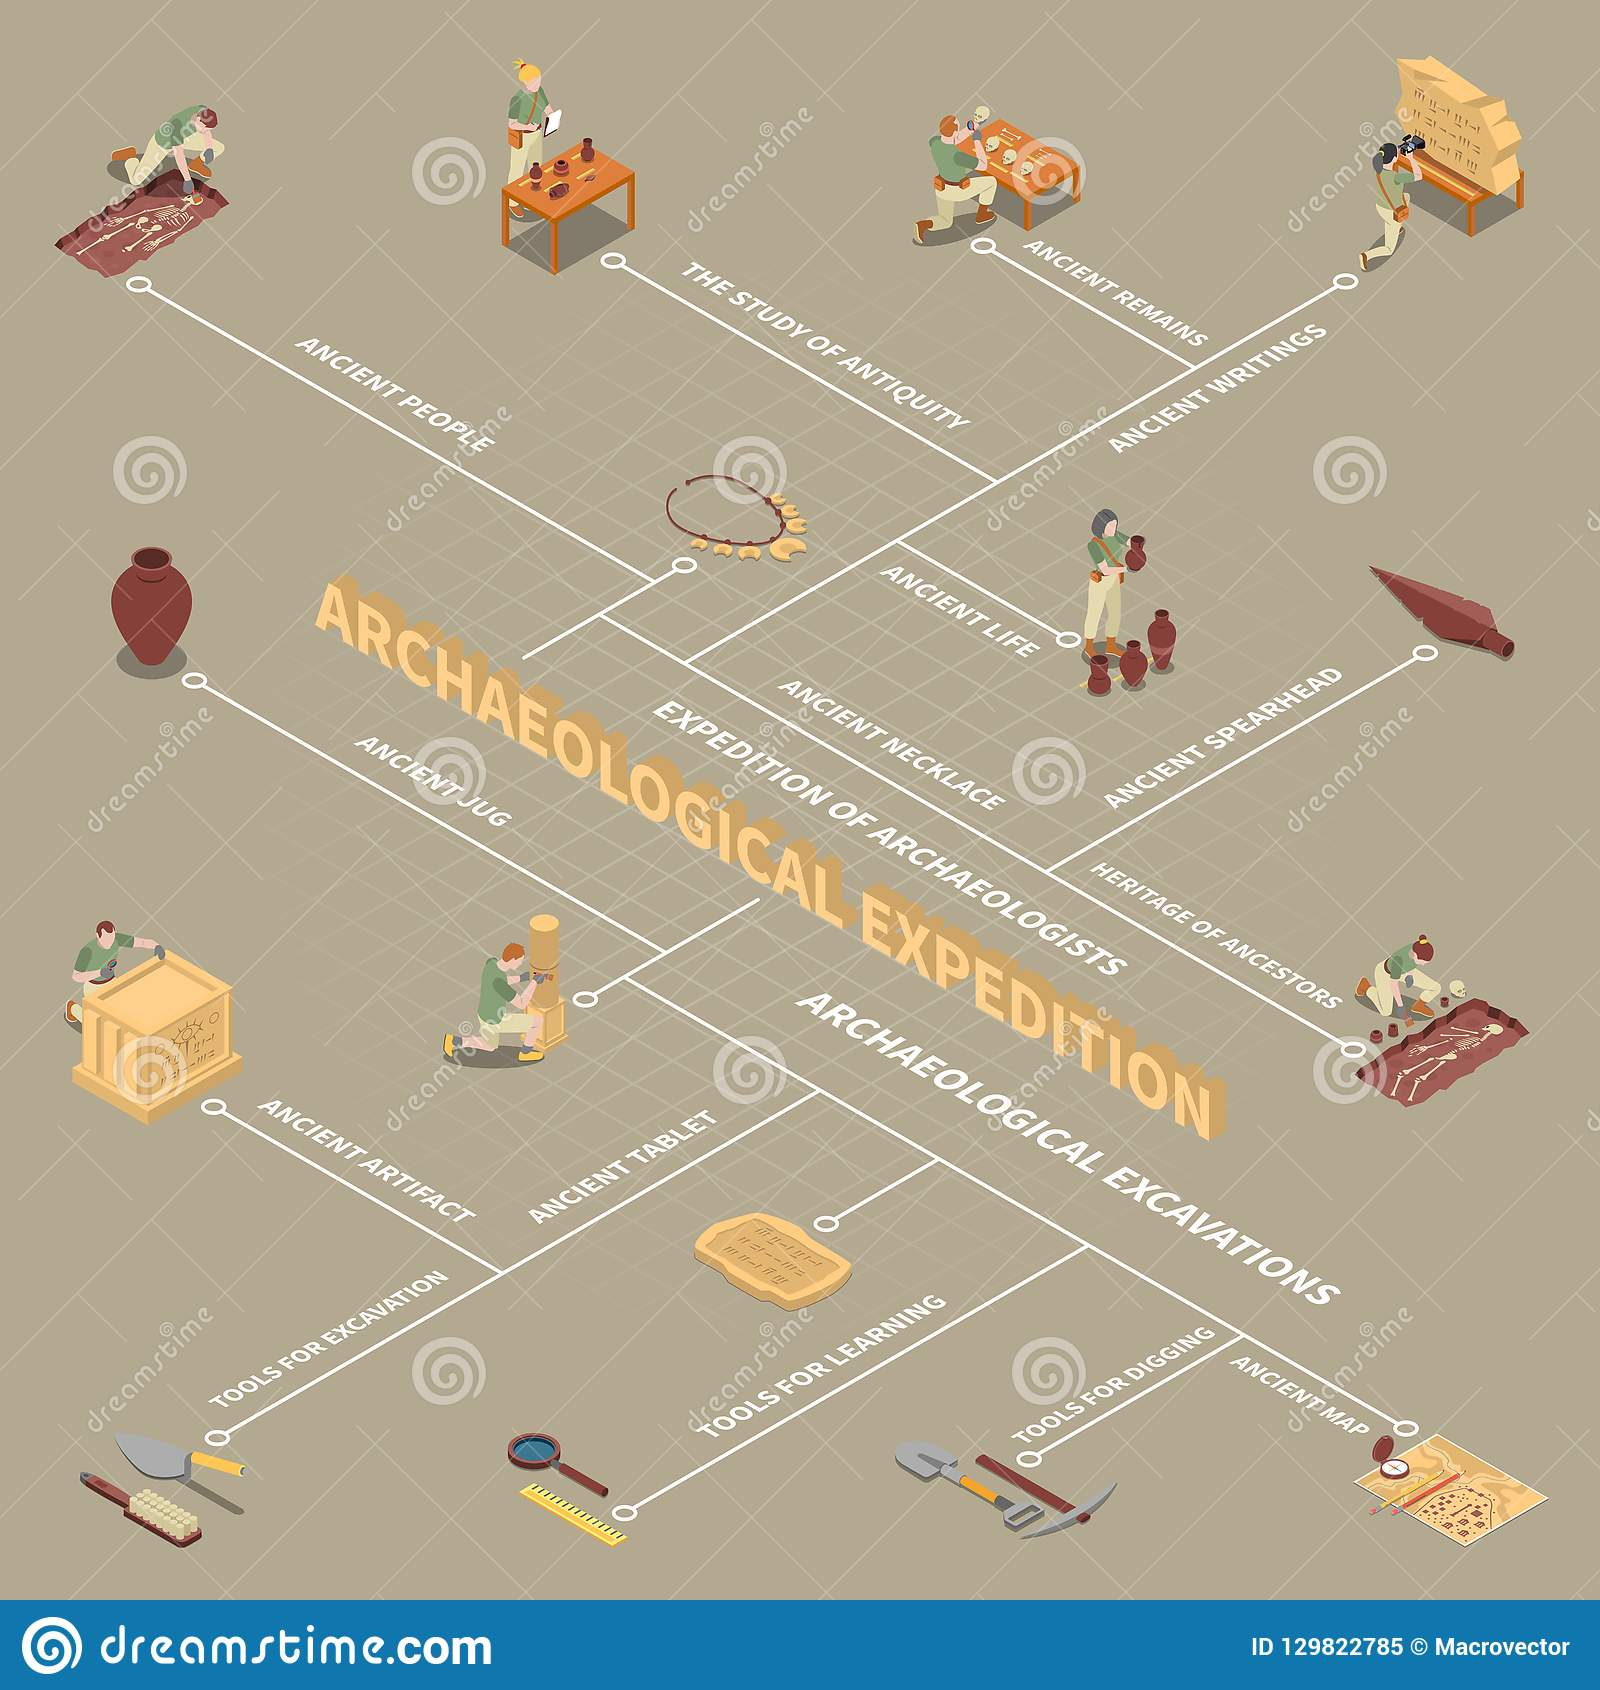 Archeology Isometric Flowchart